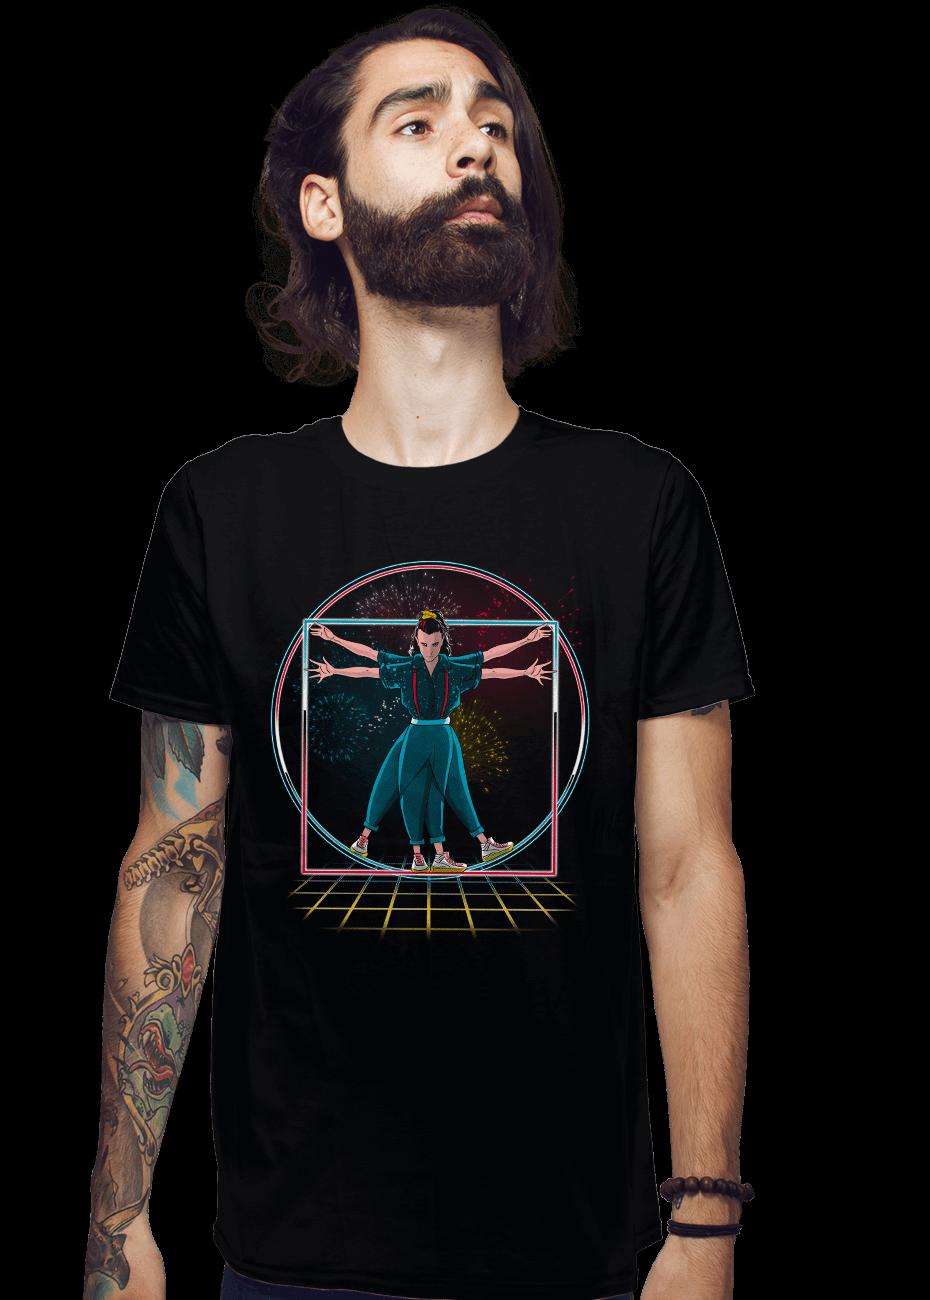 Vitruvian Things - by teesgeex